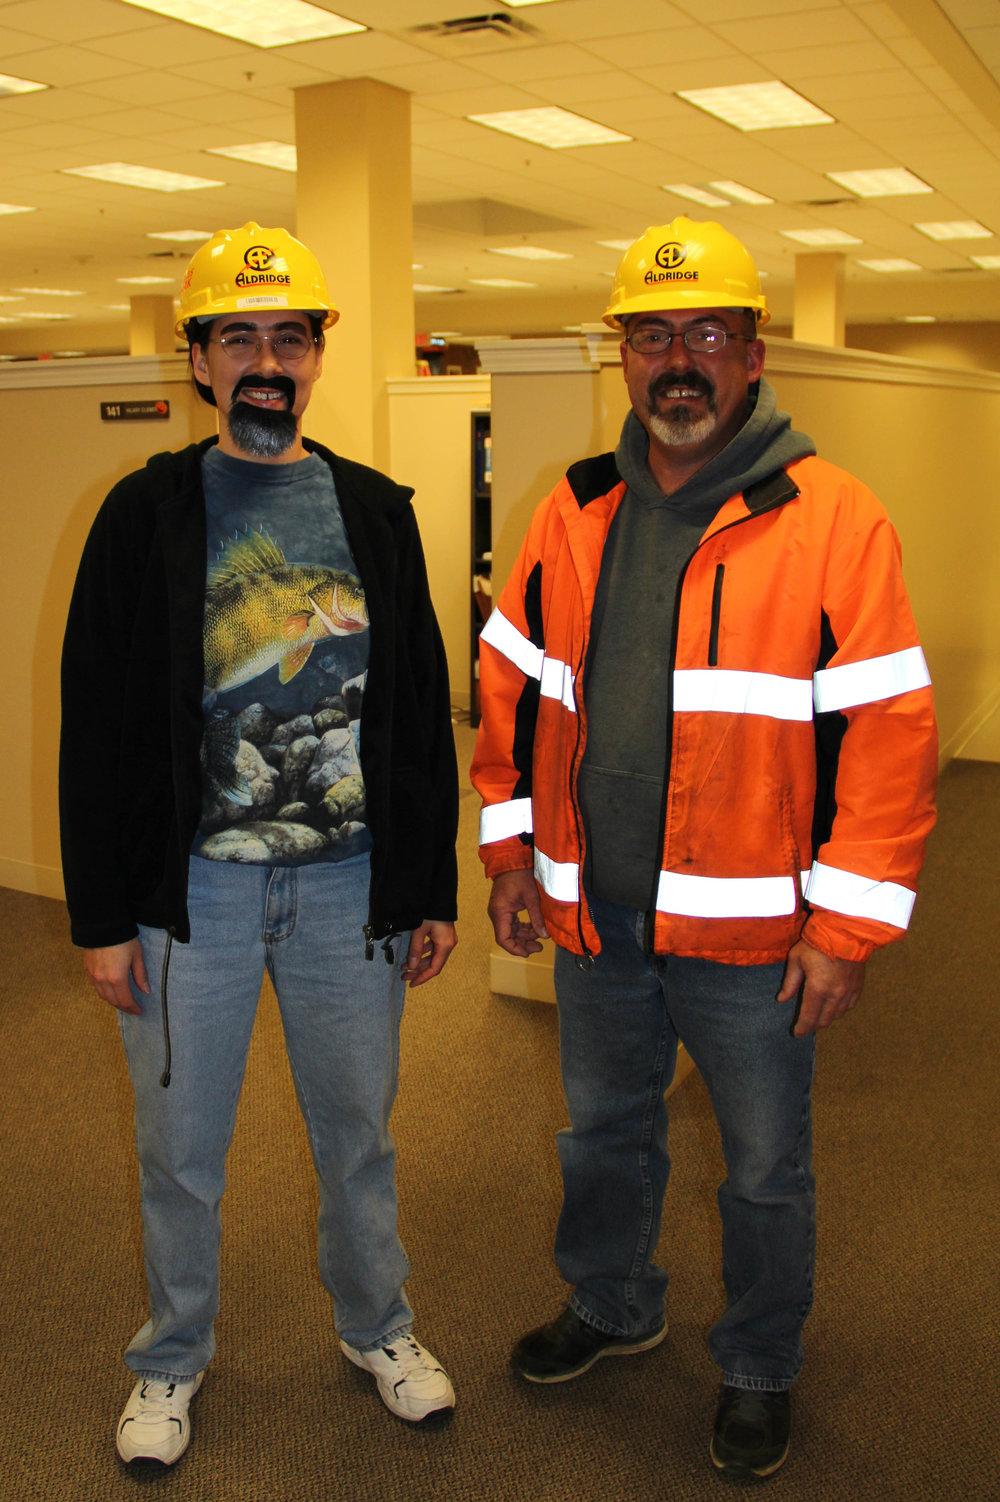 aldridge-electric-top-nationwide-us-utility-contractor-best-construction-companies-transportation-its-tolling-drilling-foundations-bridges.jpg